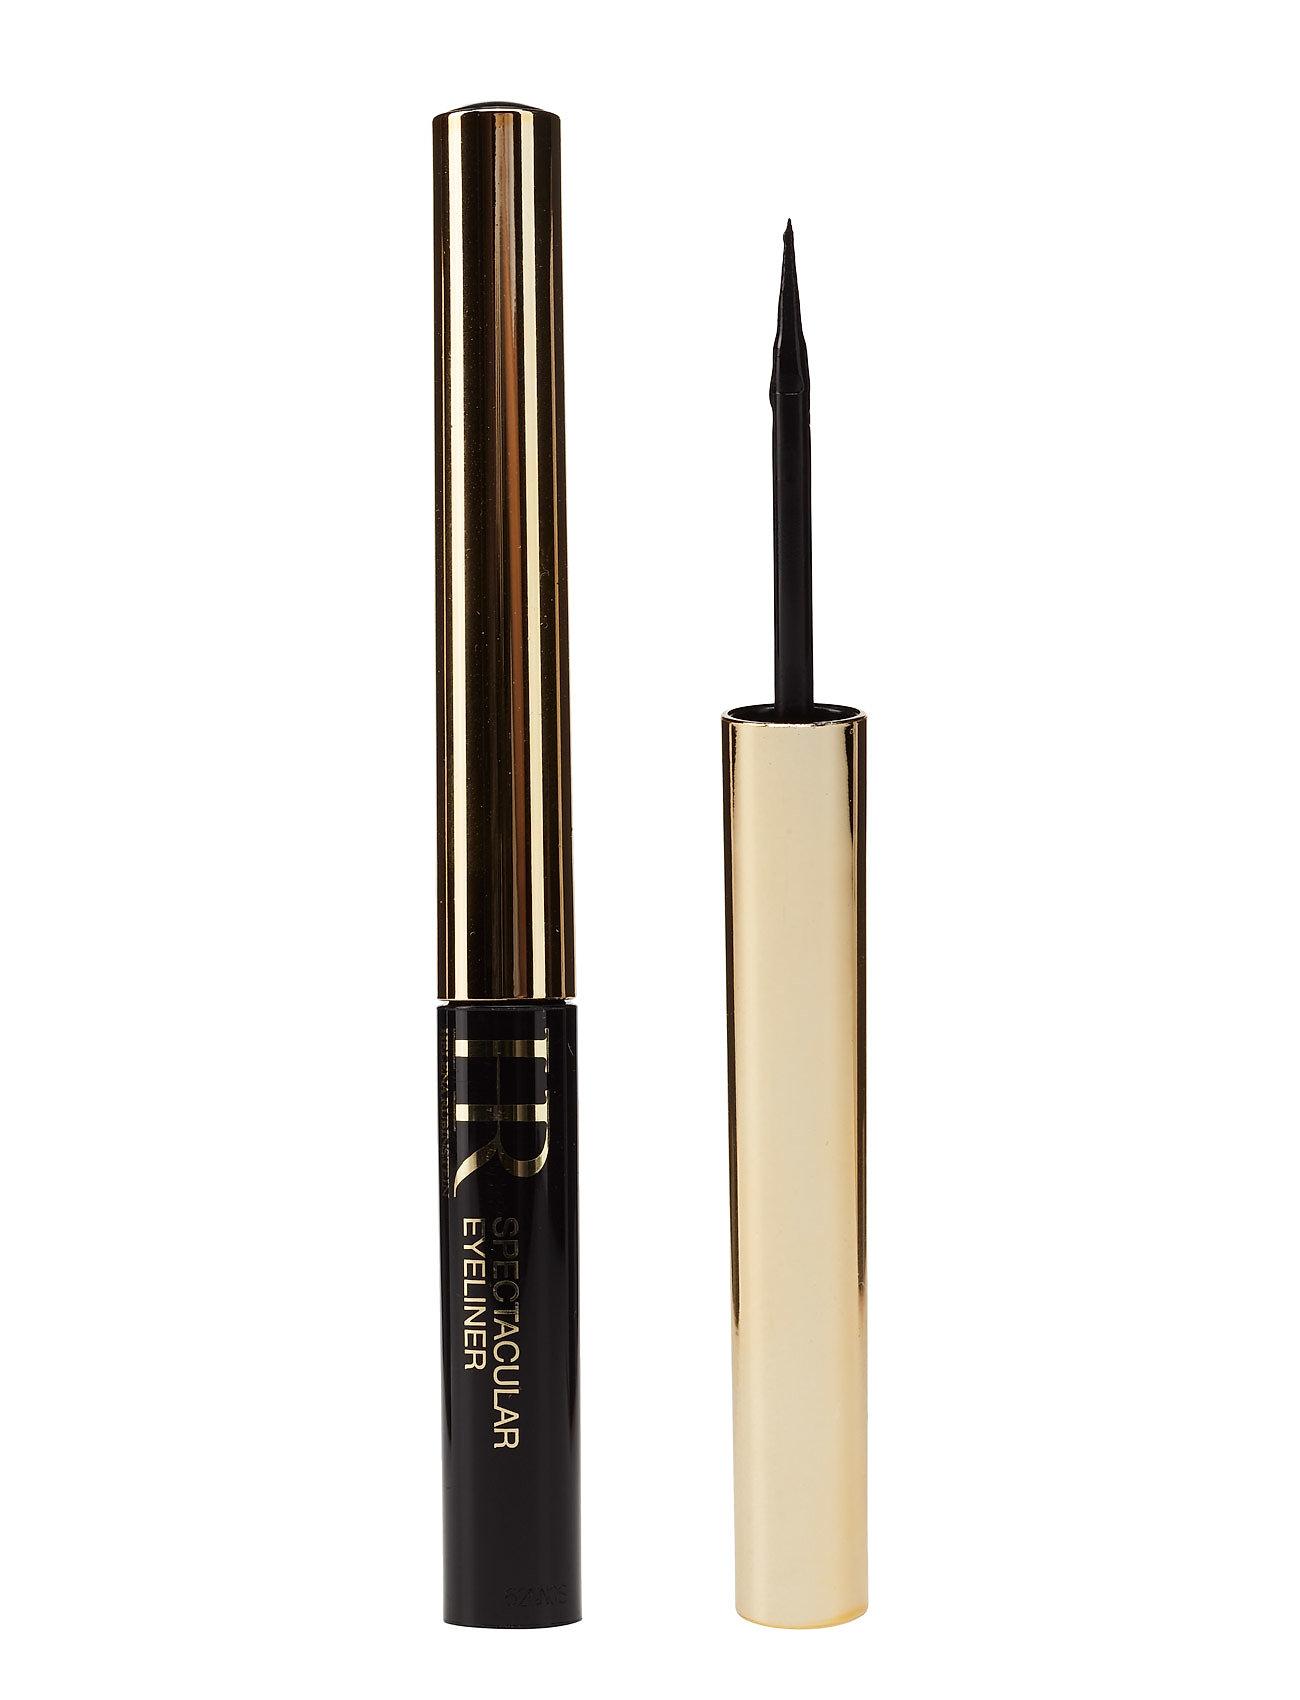 helena rubinstein – Spectacular eyeliner 01 black fra boozt.com dk